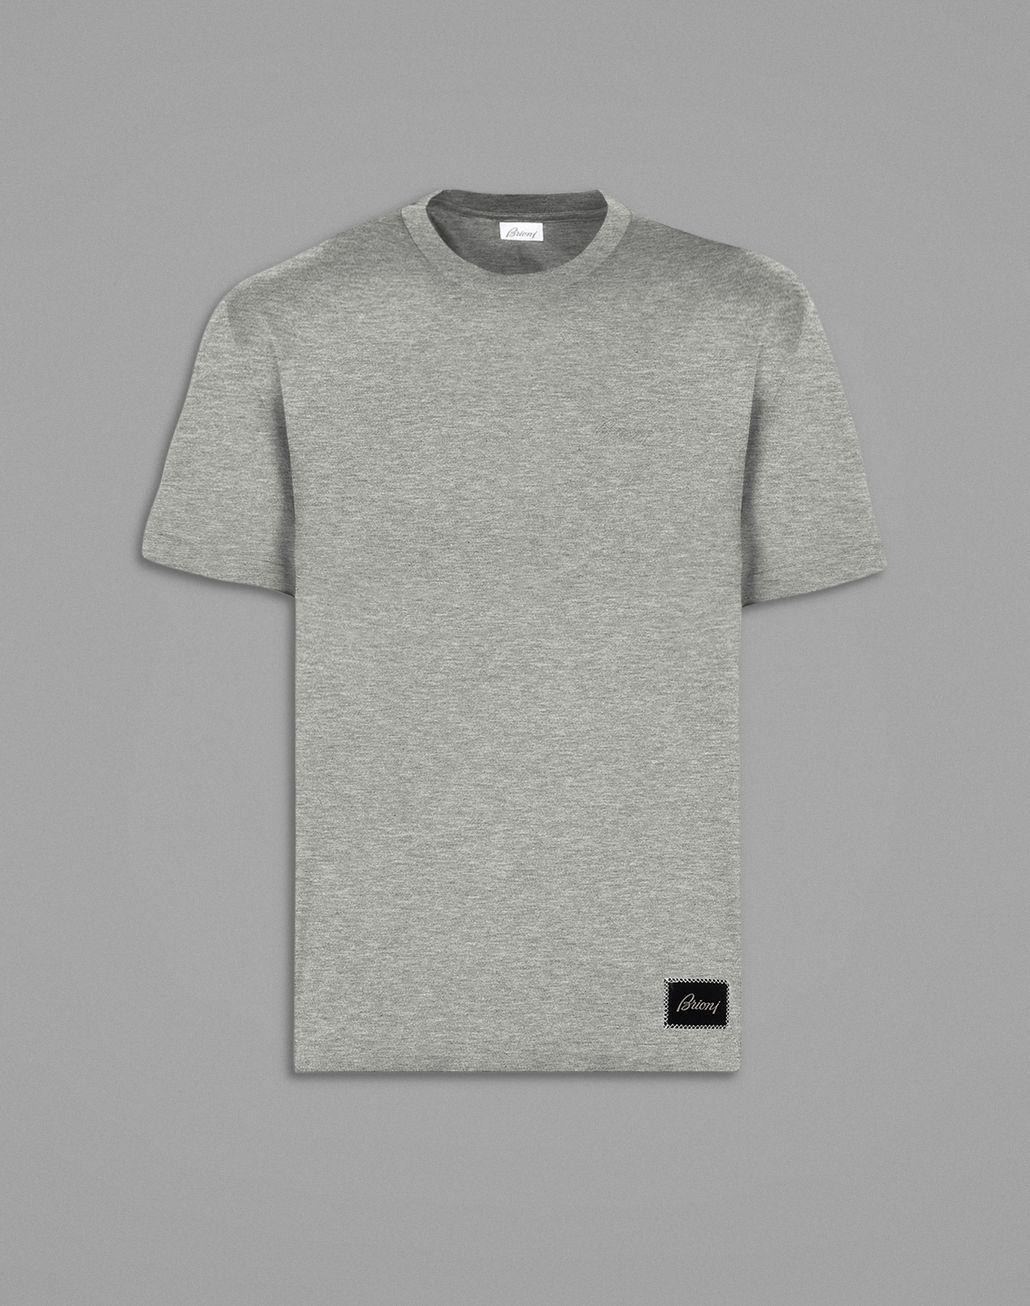 BRIONI Tシャツ グレー Tシャツ&ポロ メンズ f